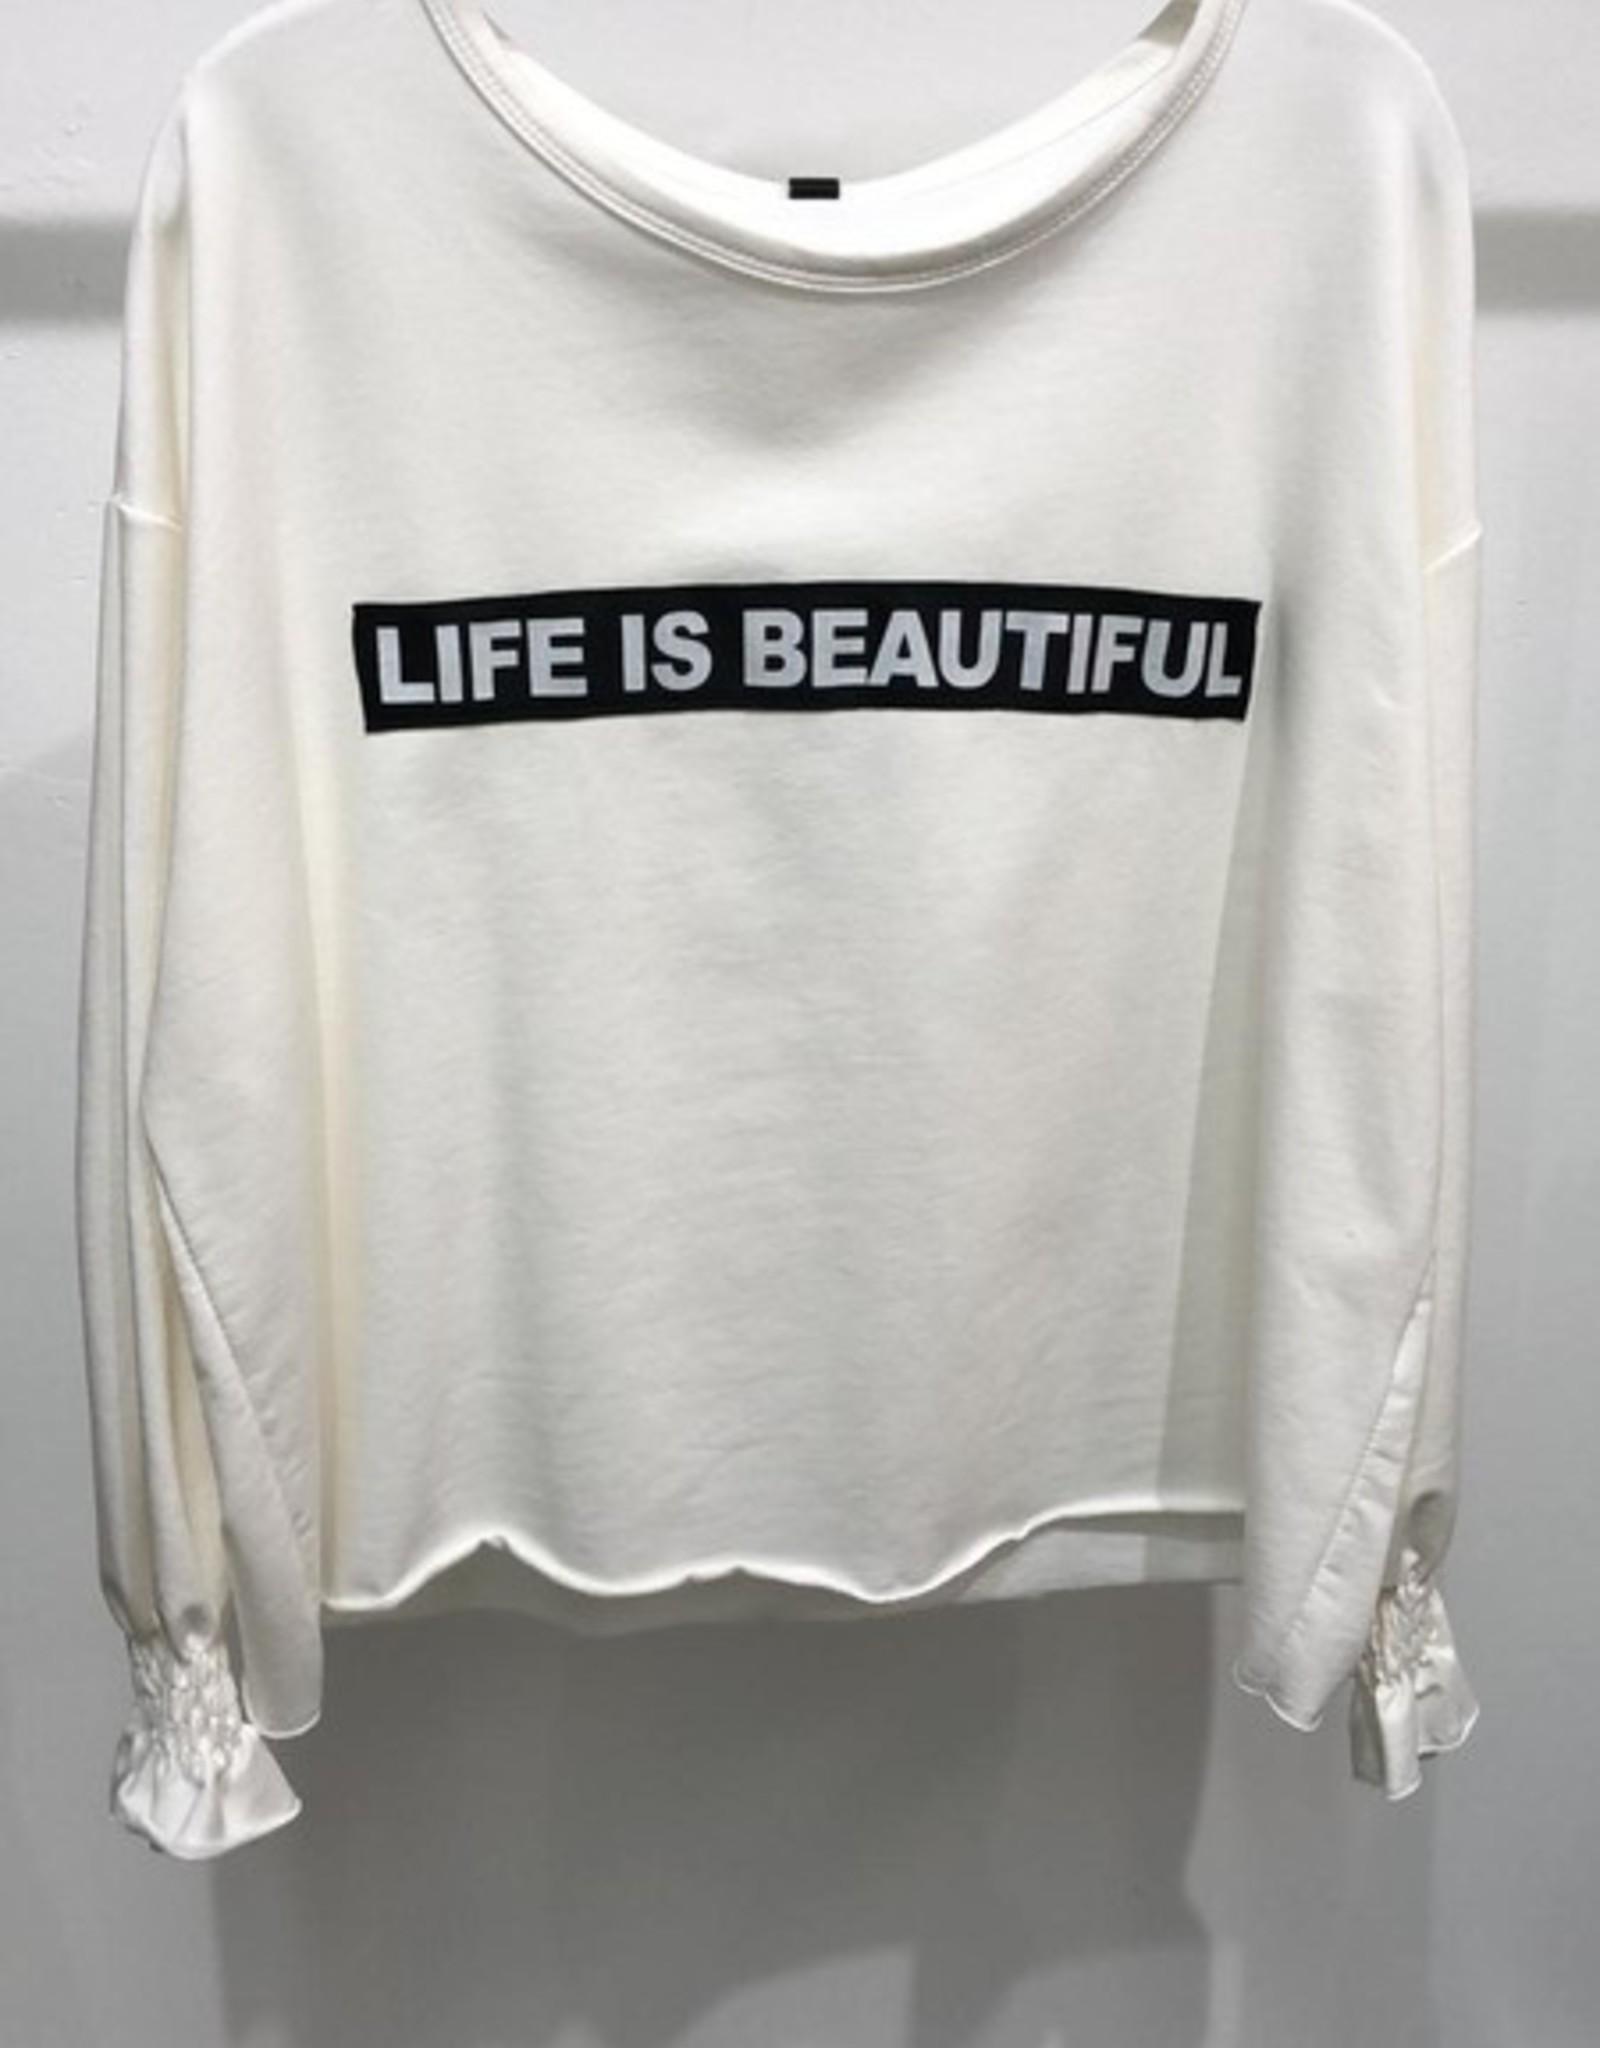 Life is beautiful top